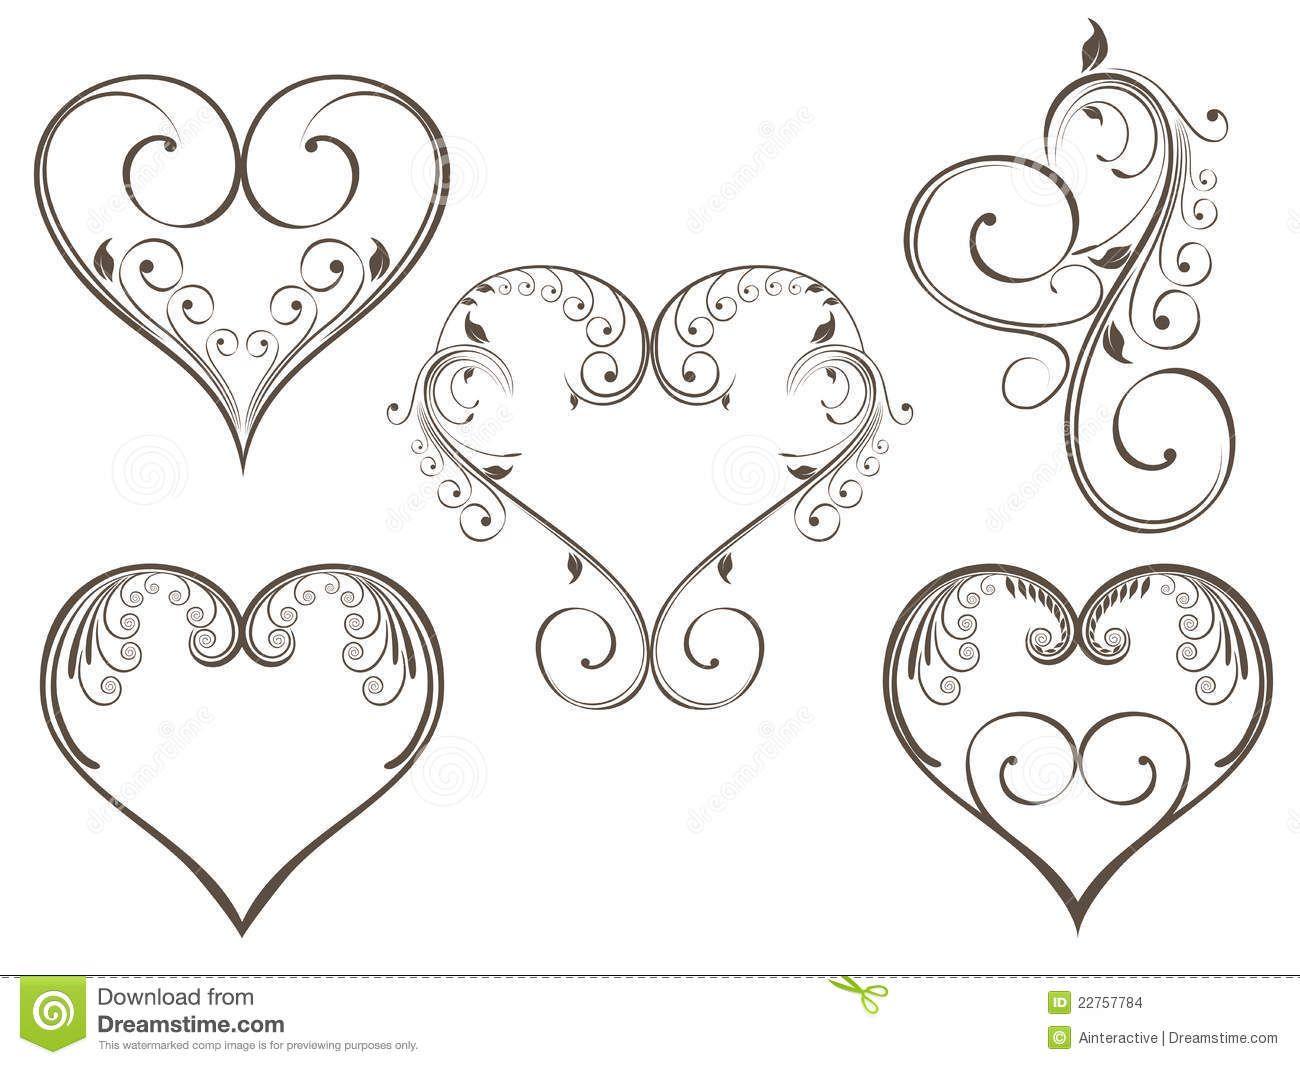 Heart Line Art Design : Floral heart scrolls g swish